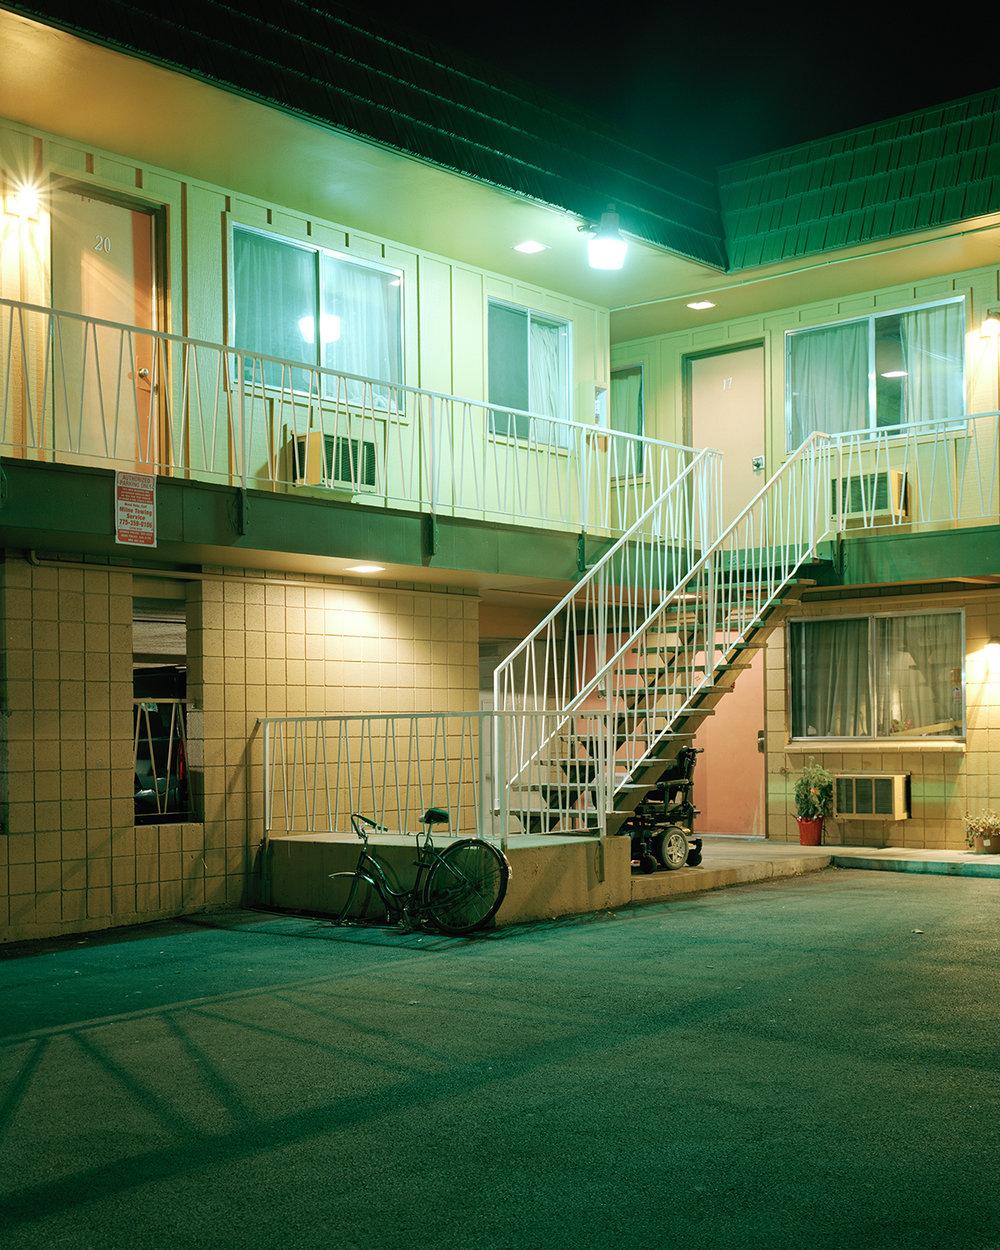 Reno Motel Green.jpg